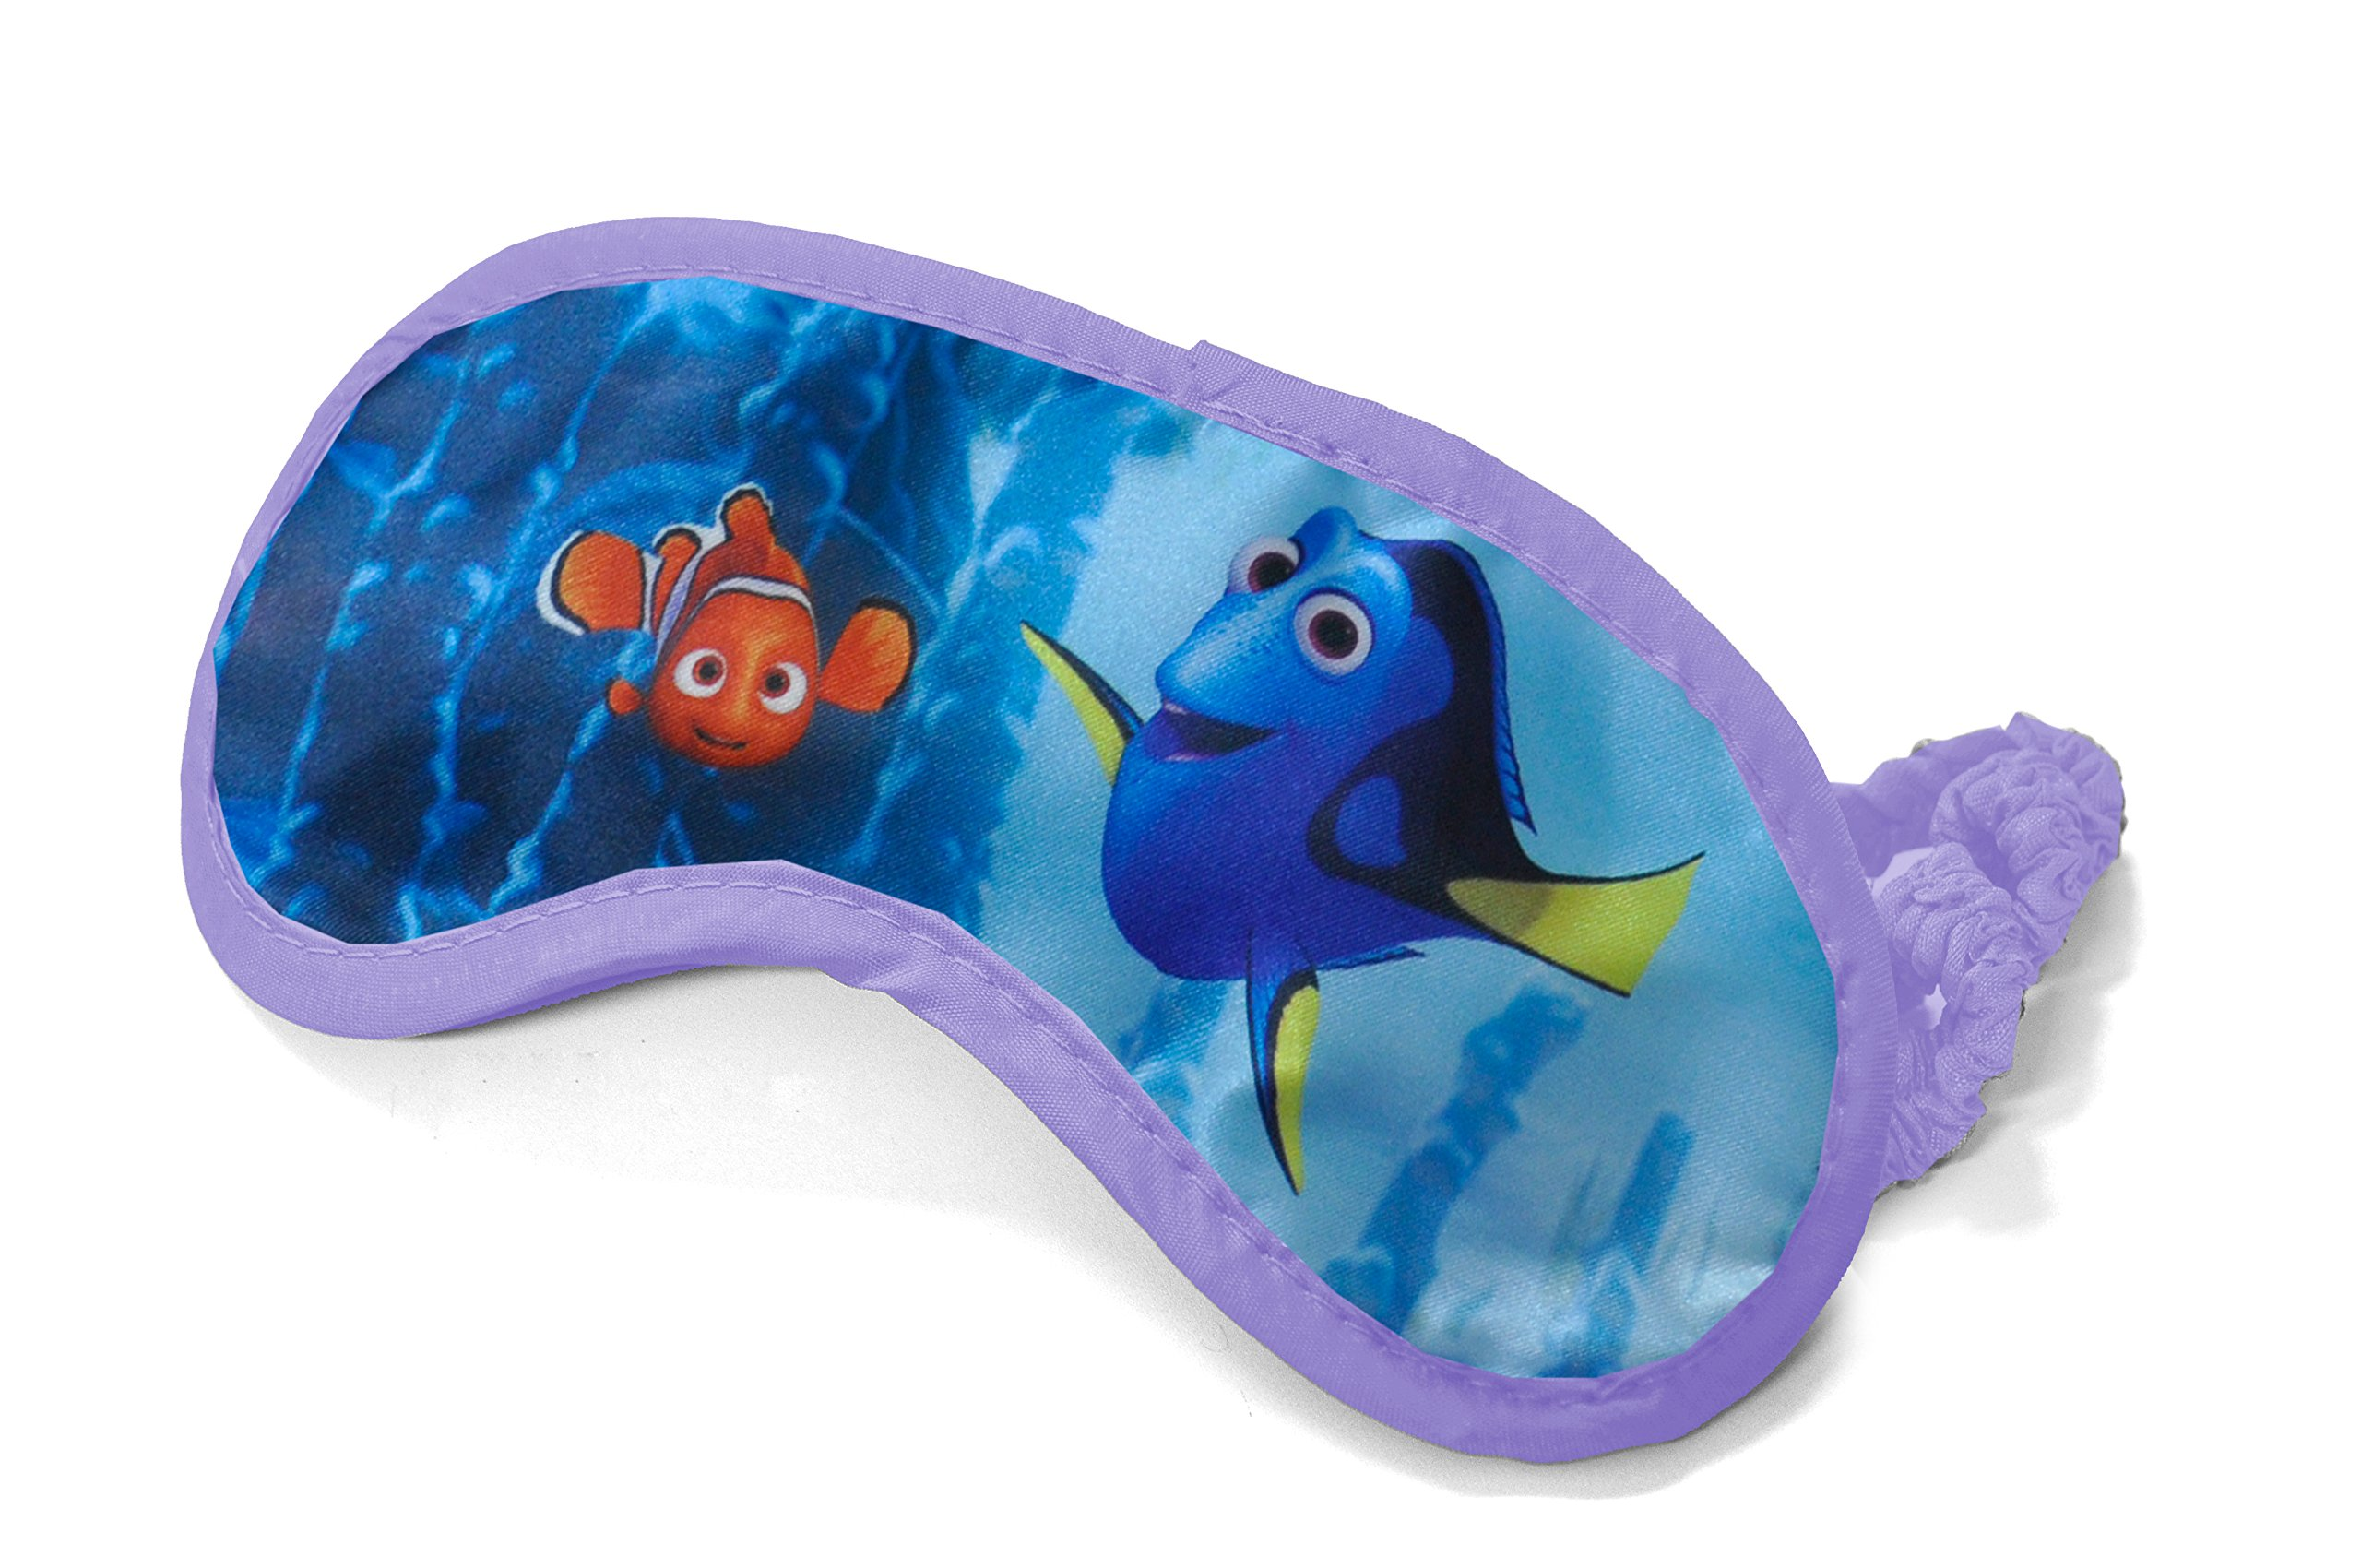 Disney Finding Dory Sleepover Purse by Disney (Image #3)